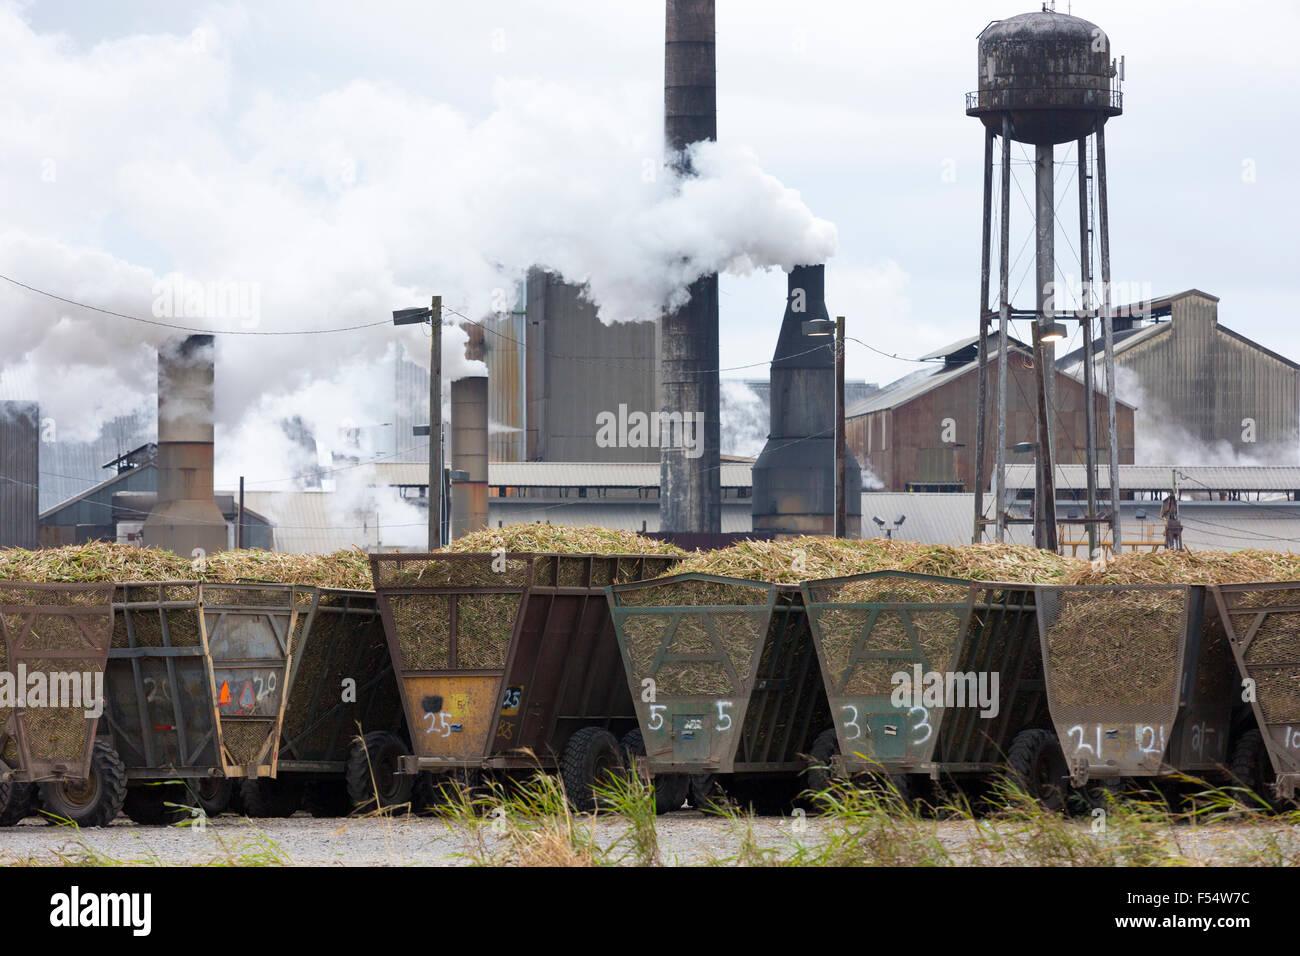 Sugarcane production factory St Mary Sugar Cooperative Sugar Mill processing raw sugar at Jeanerette, Louisiana, - Stock Image